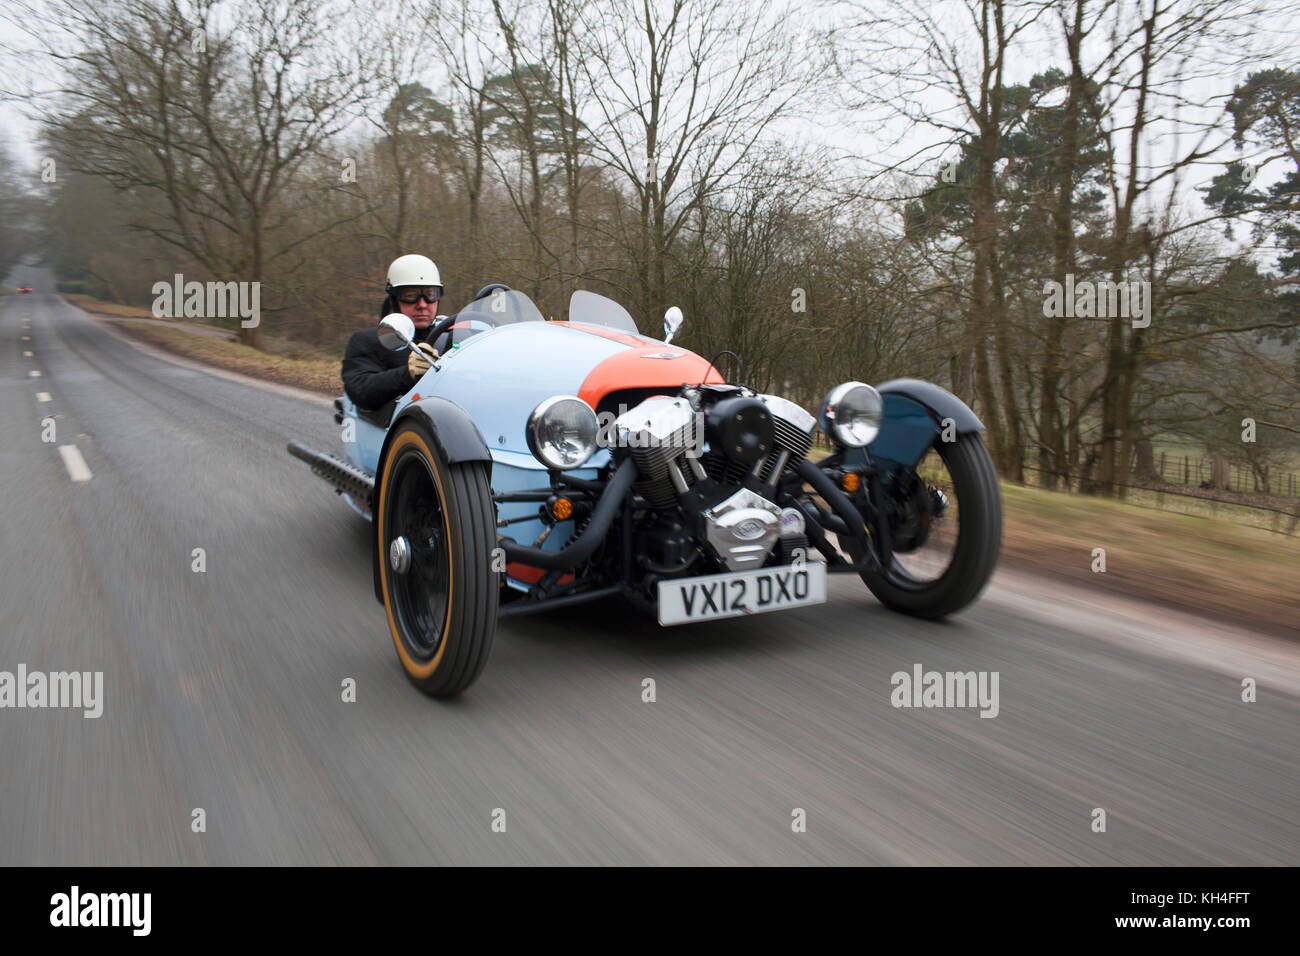 A Morgan three wheeler being driven through the British countryside. - Stock Image